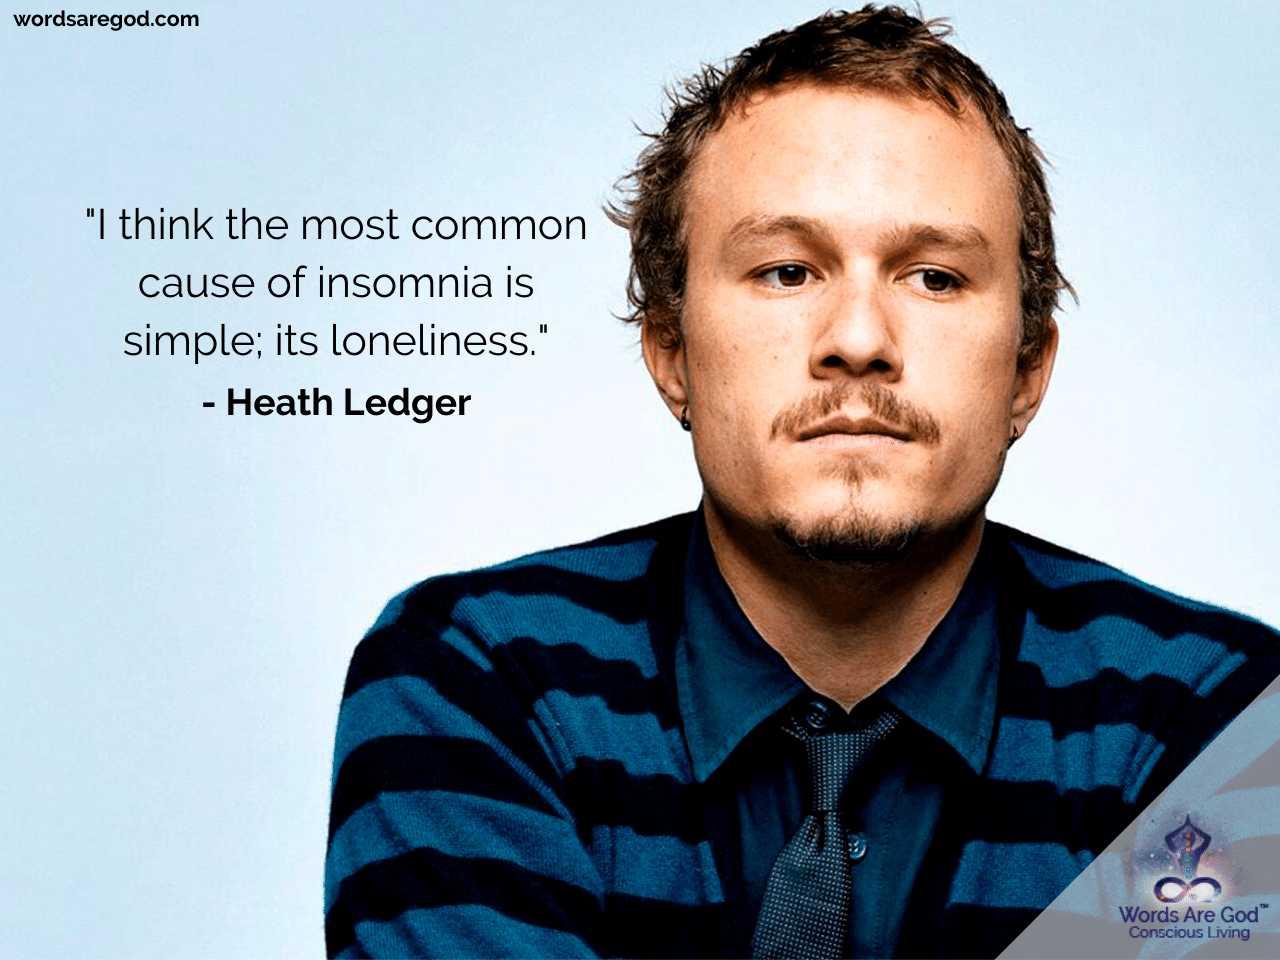 Heath Ledger Life Quotes by Heath Ledger